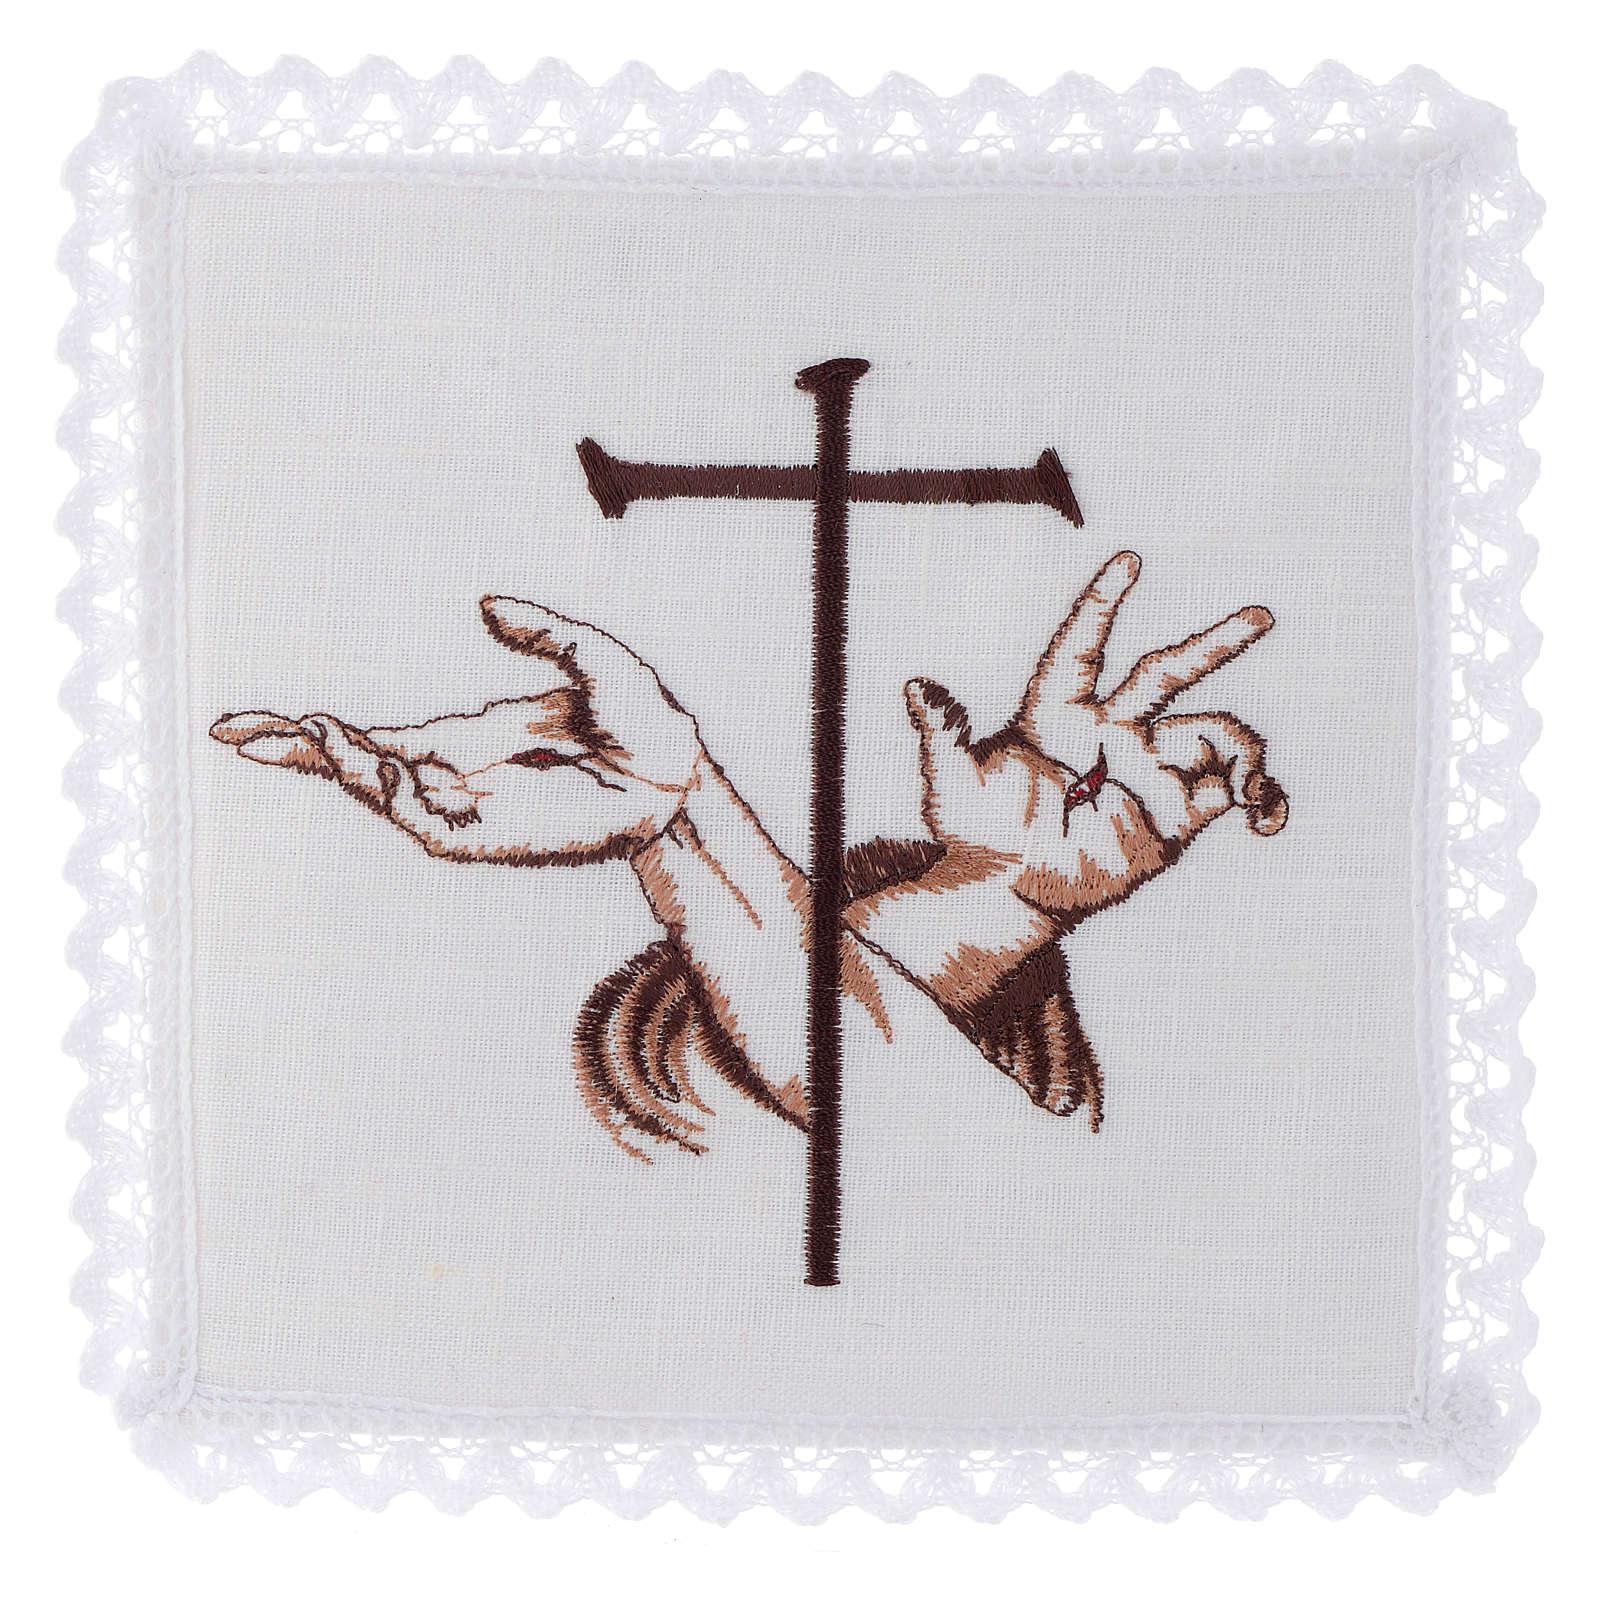 Altar linen Stigmata hands of Jesus & Cross 4